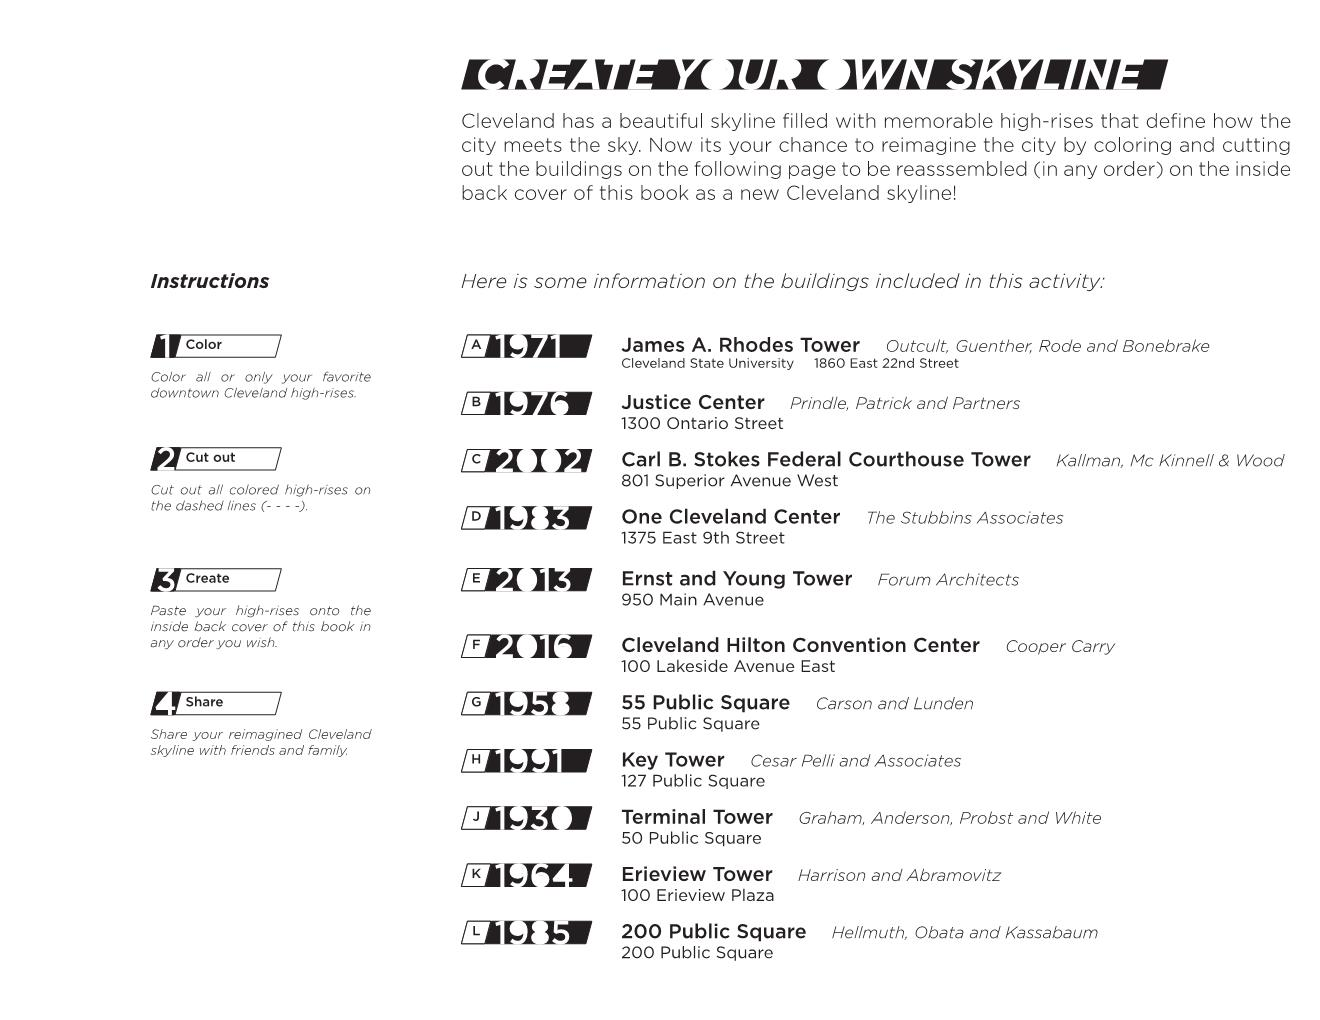 CACB v3 Page 028.jpg